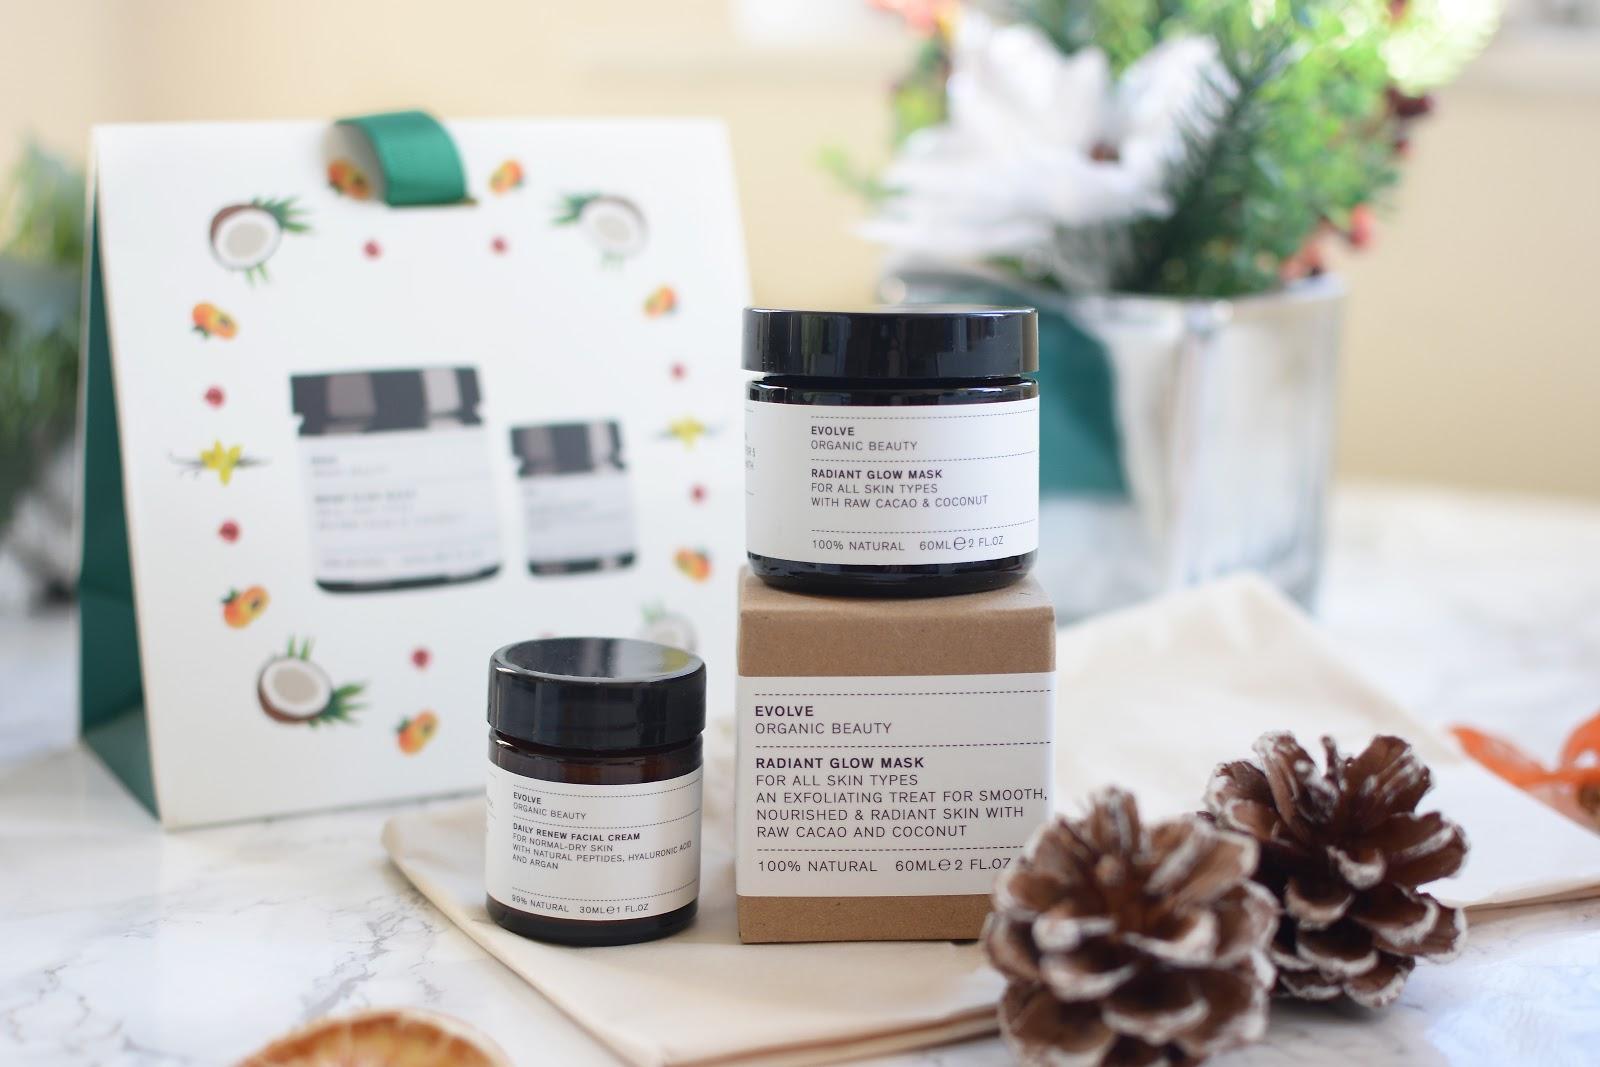 Evolve Organic Beauty Chocolate Skin Heaven Gift Set